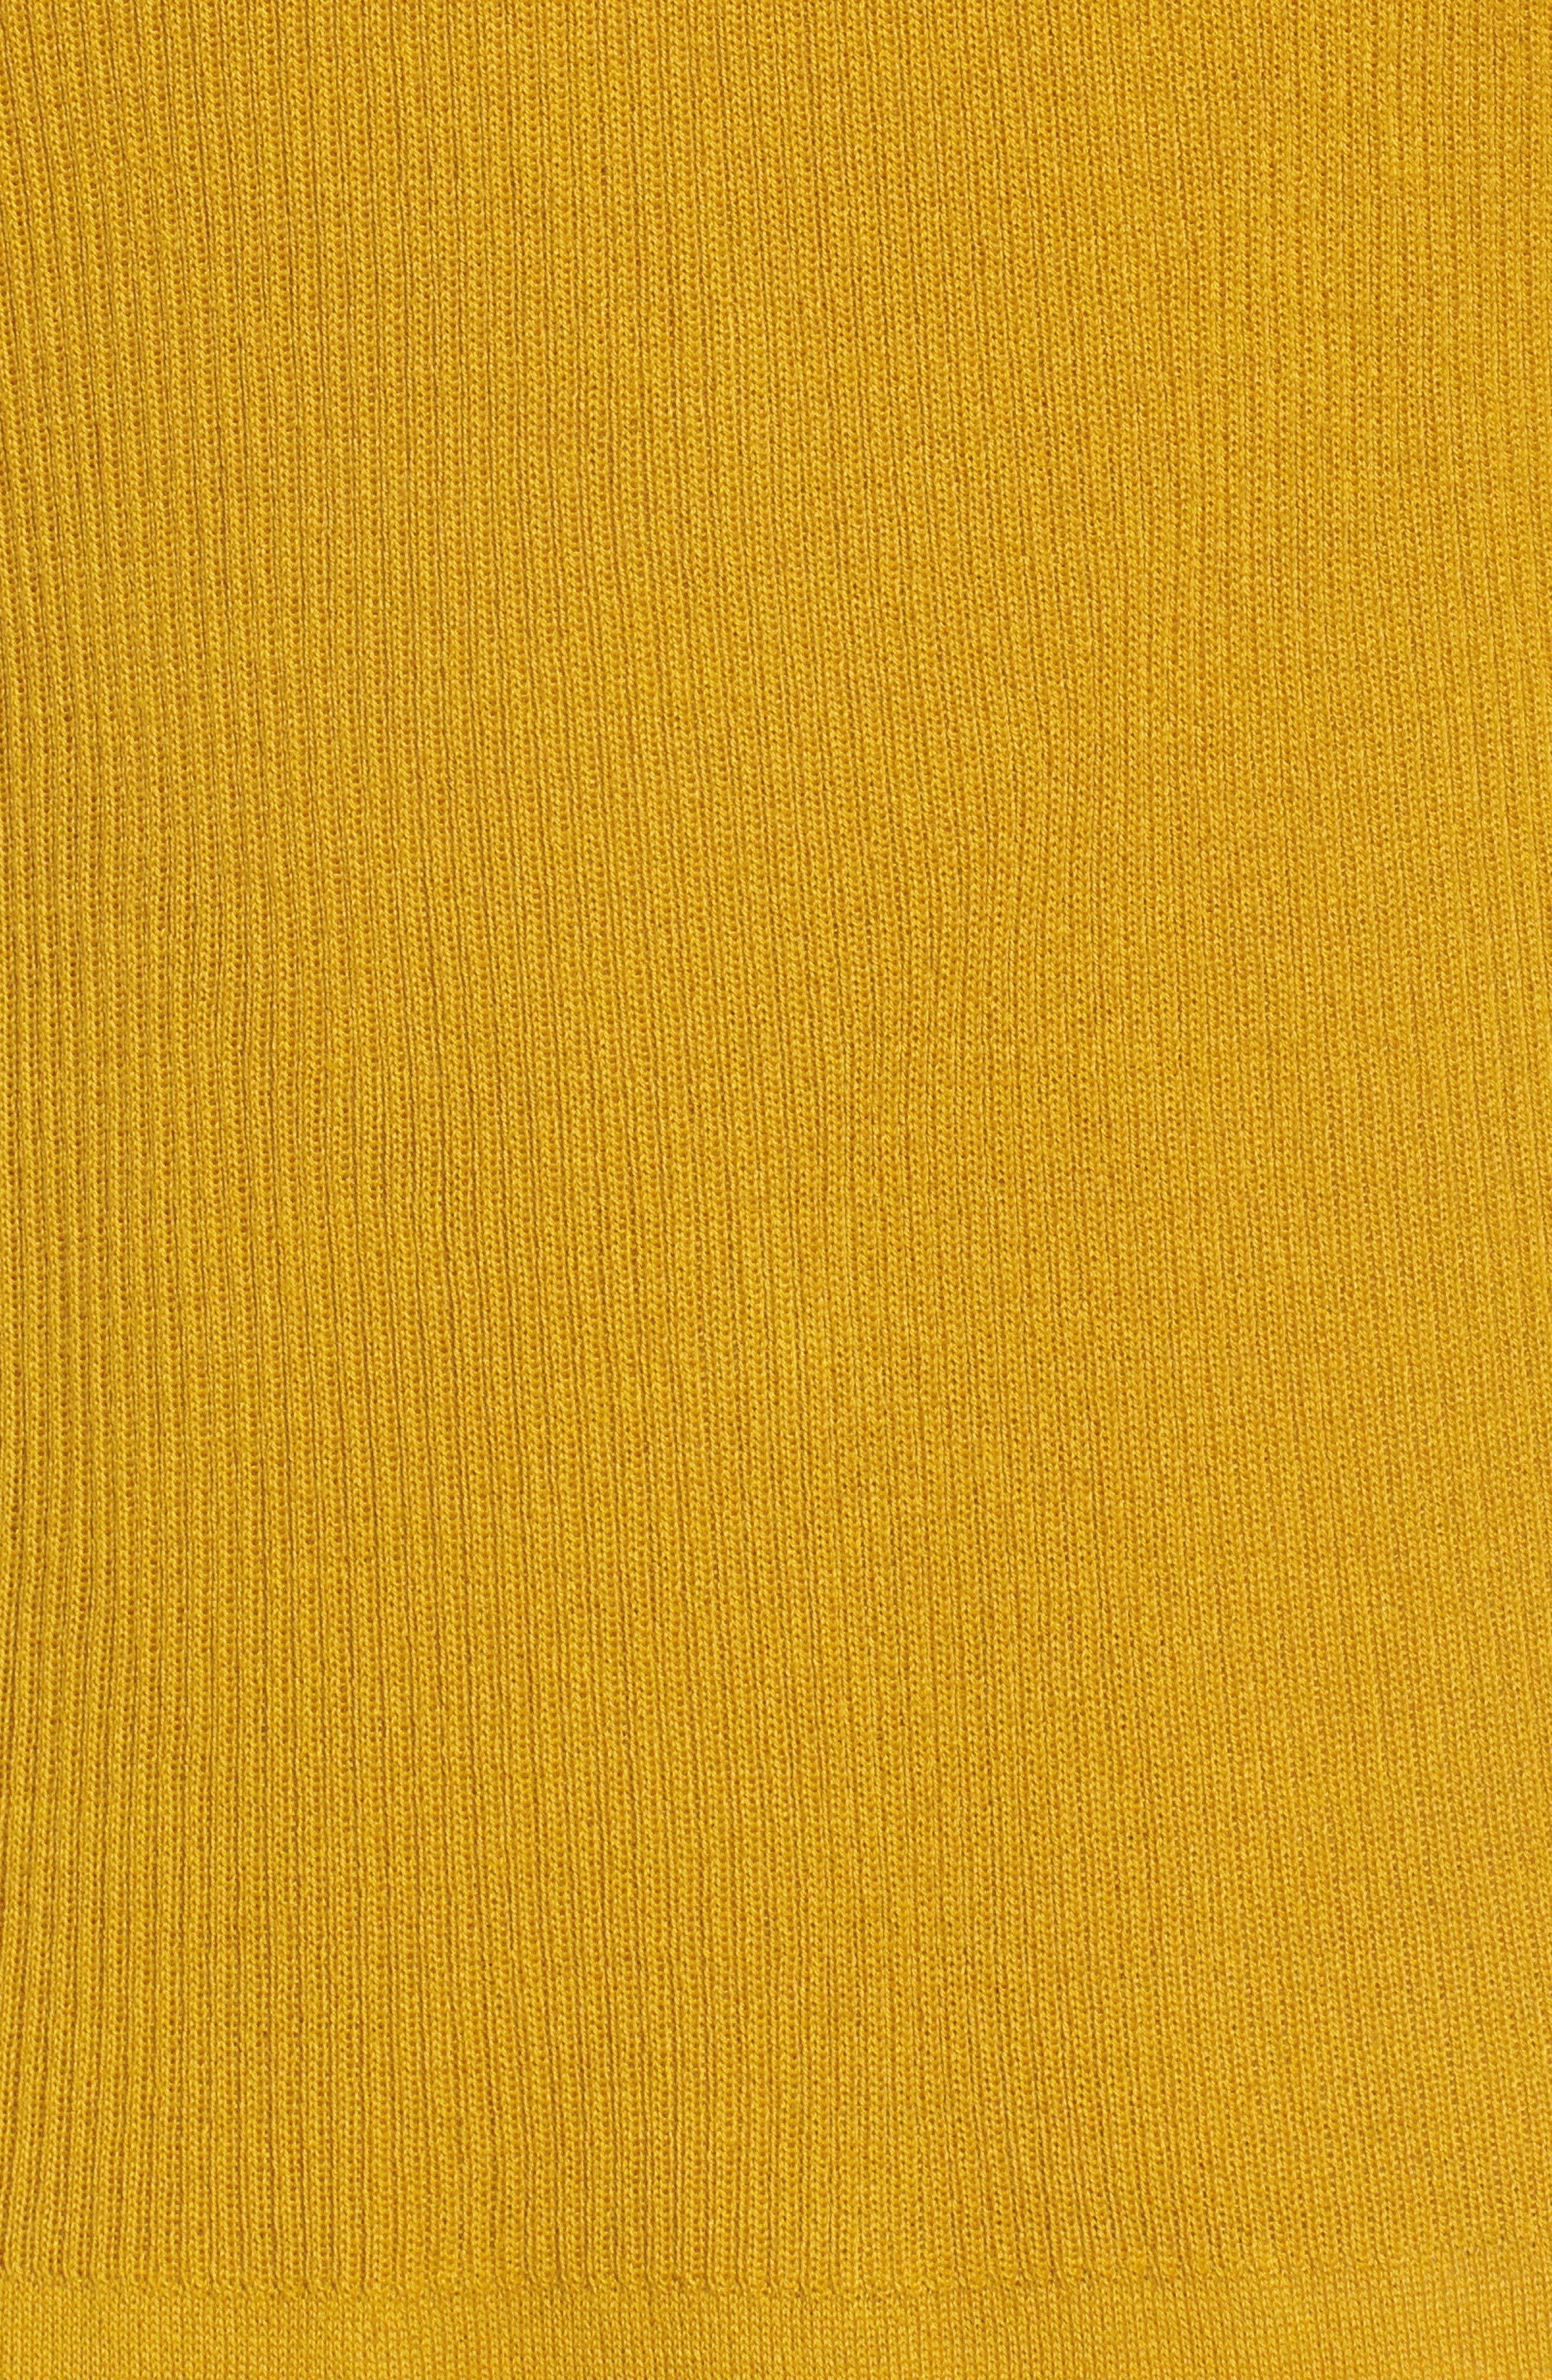 Rib Knit Wool Blend Cardigan,                             Alternate thumbnail 5, color,                             701